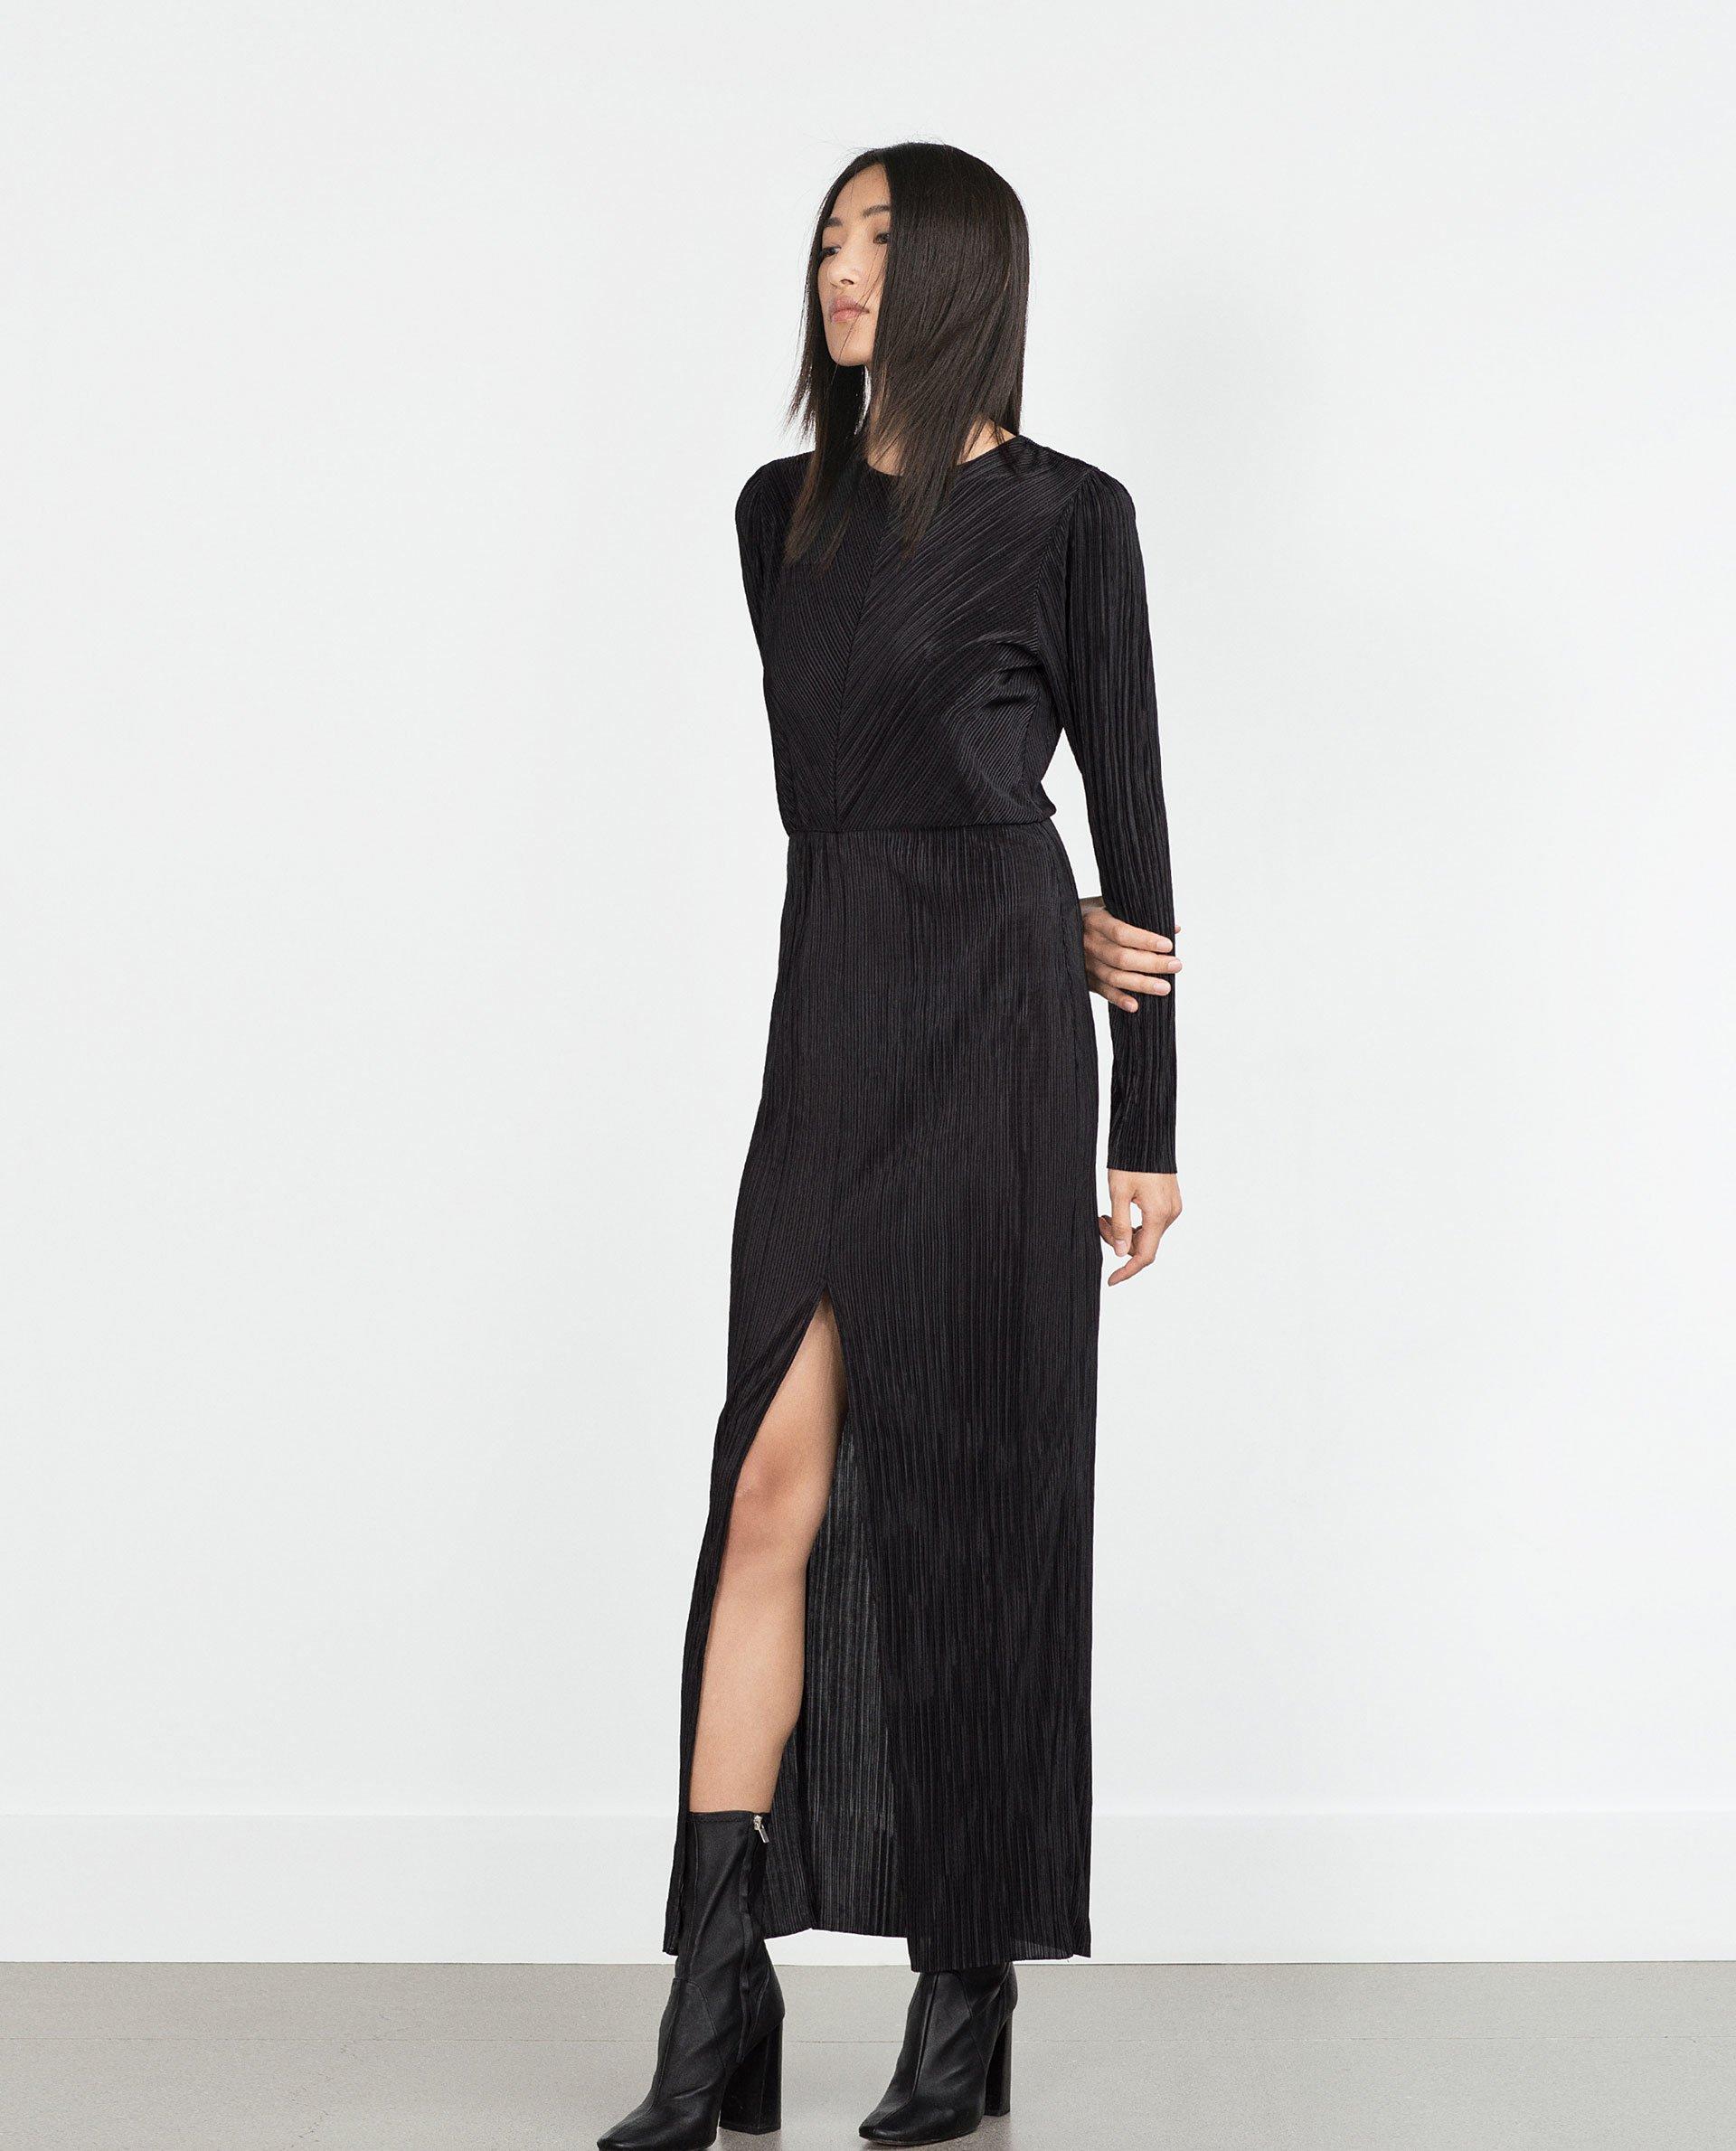 Black Pleated Dress Dress Yp